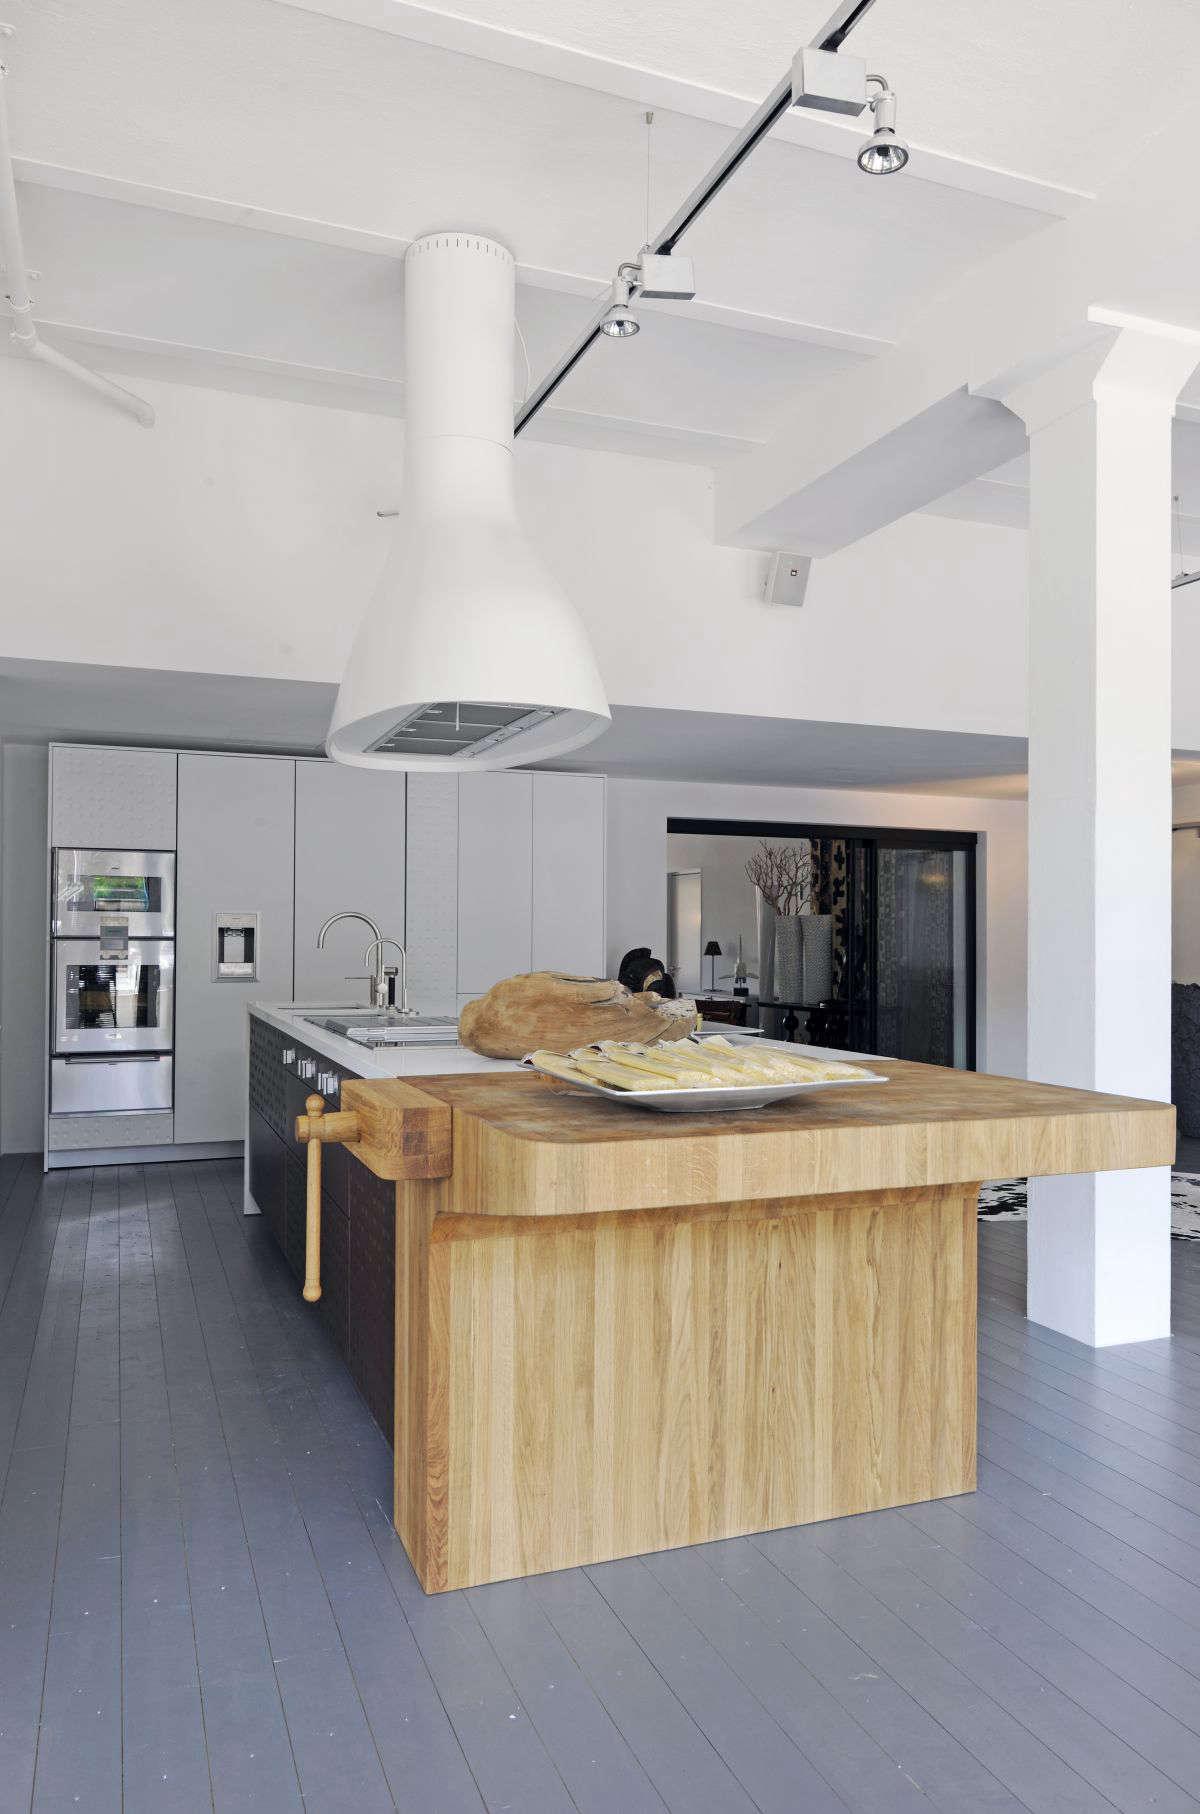 Italian kitchen designers Schiffini use end-grain butcher block at the end of a kitchen island.